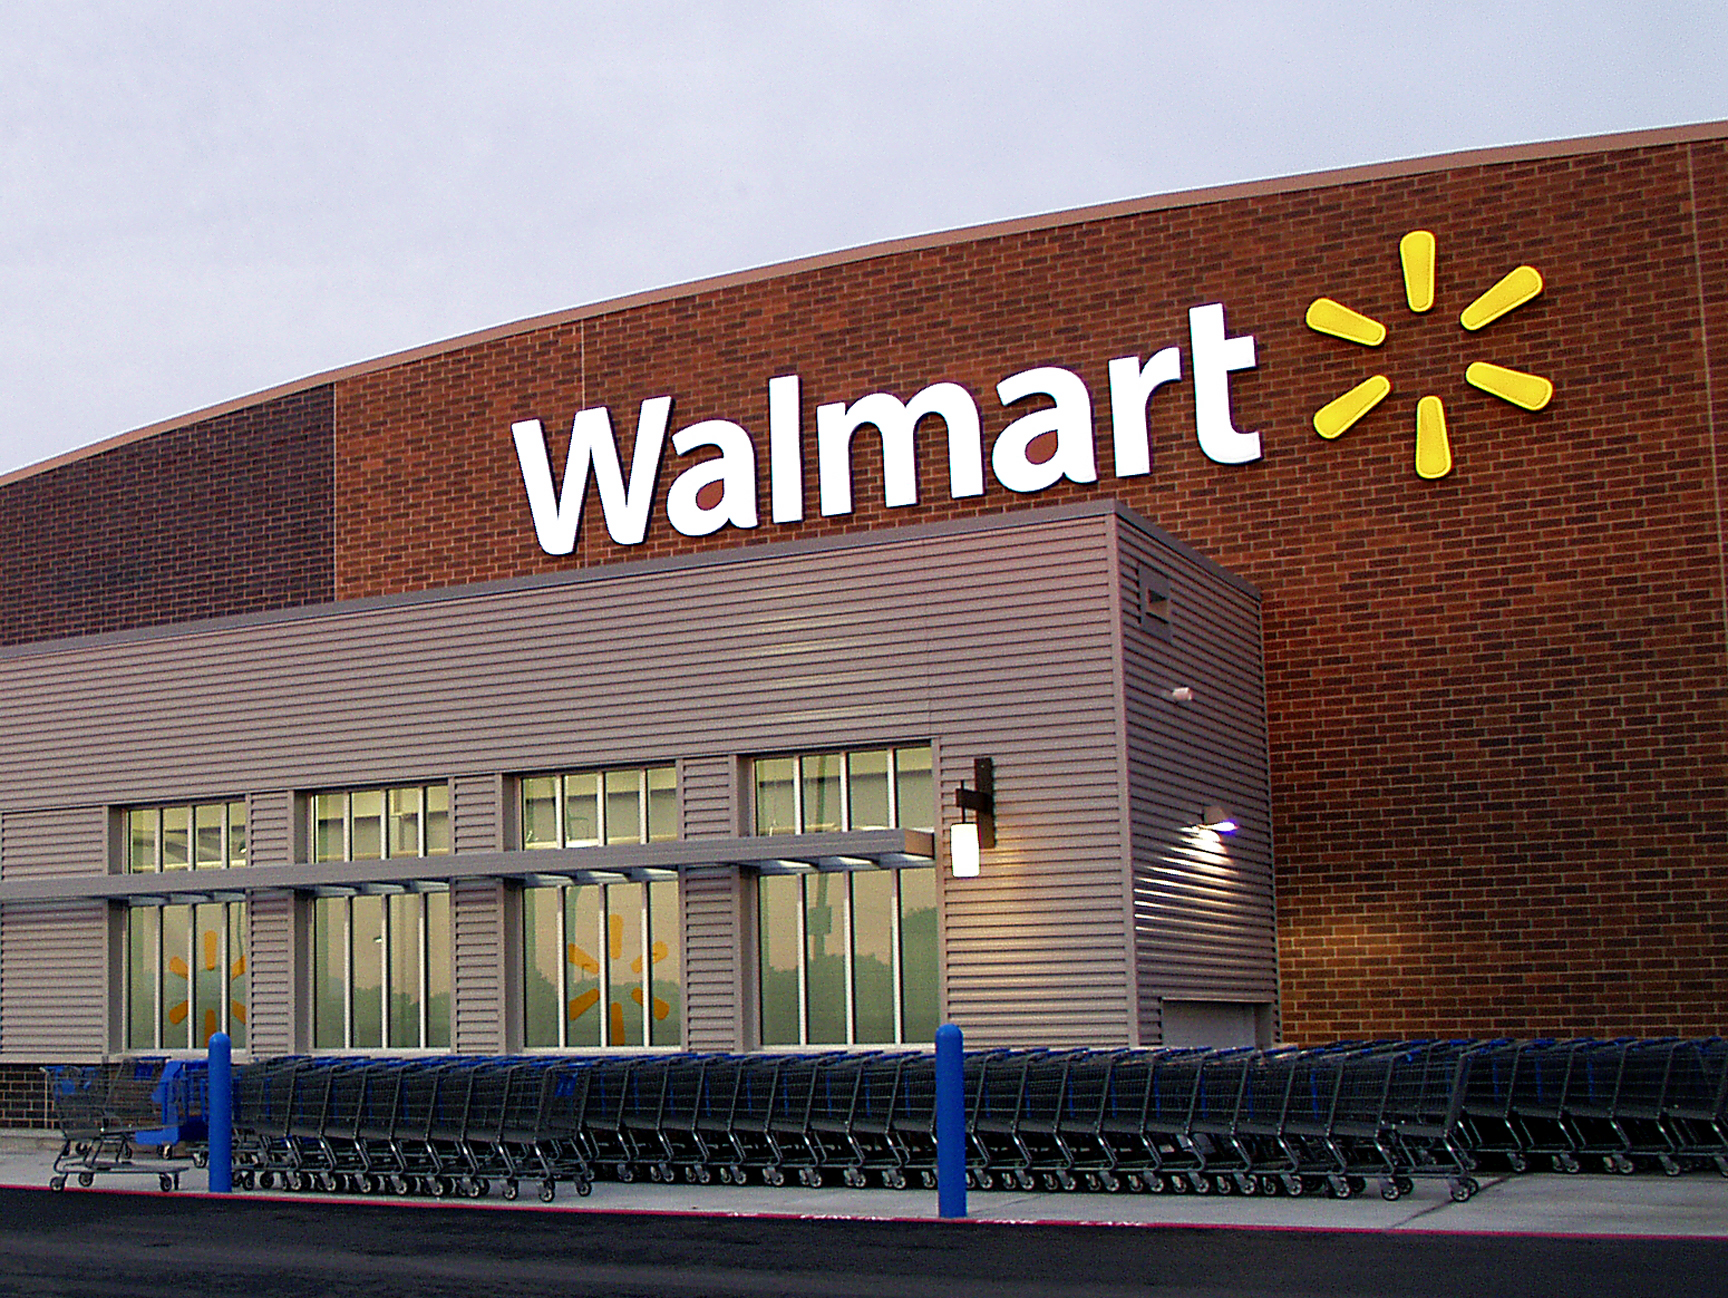 https://i2.wp.com/business-ethics.com/wp-content/uploads/2010/03/Walmart_Store.jpg